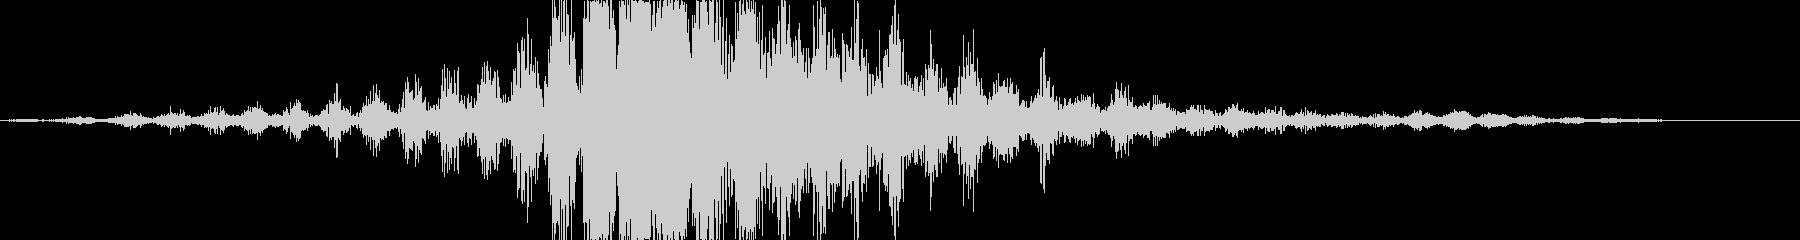 CINEMATIC WHOOSH 05の未再生の波形